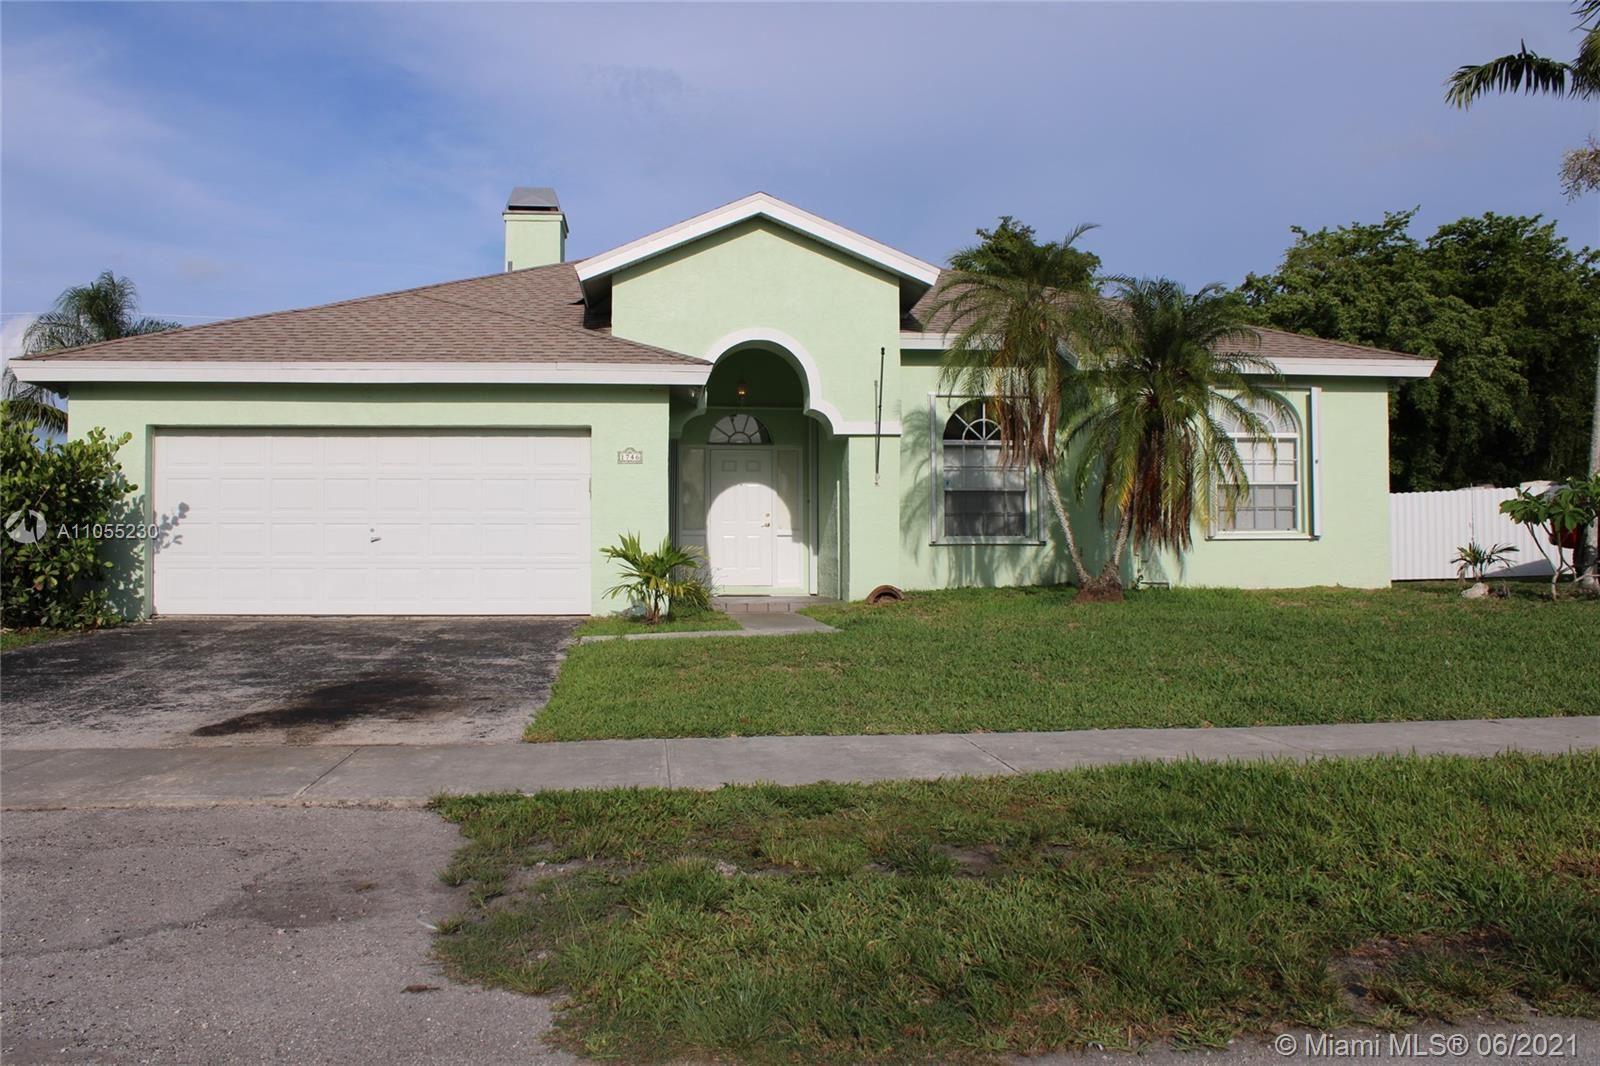 1746 S Curlew Ln, Homestead, FL 33035 - #: A11055230